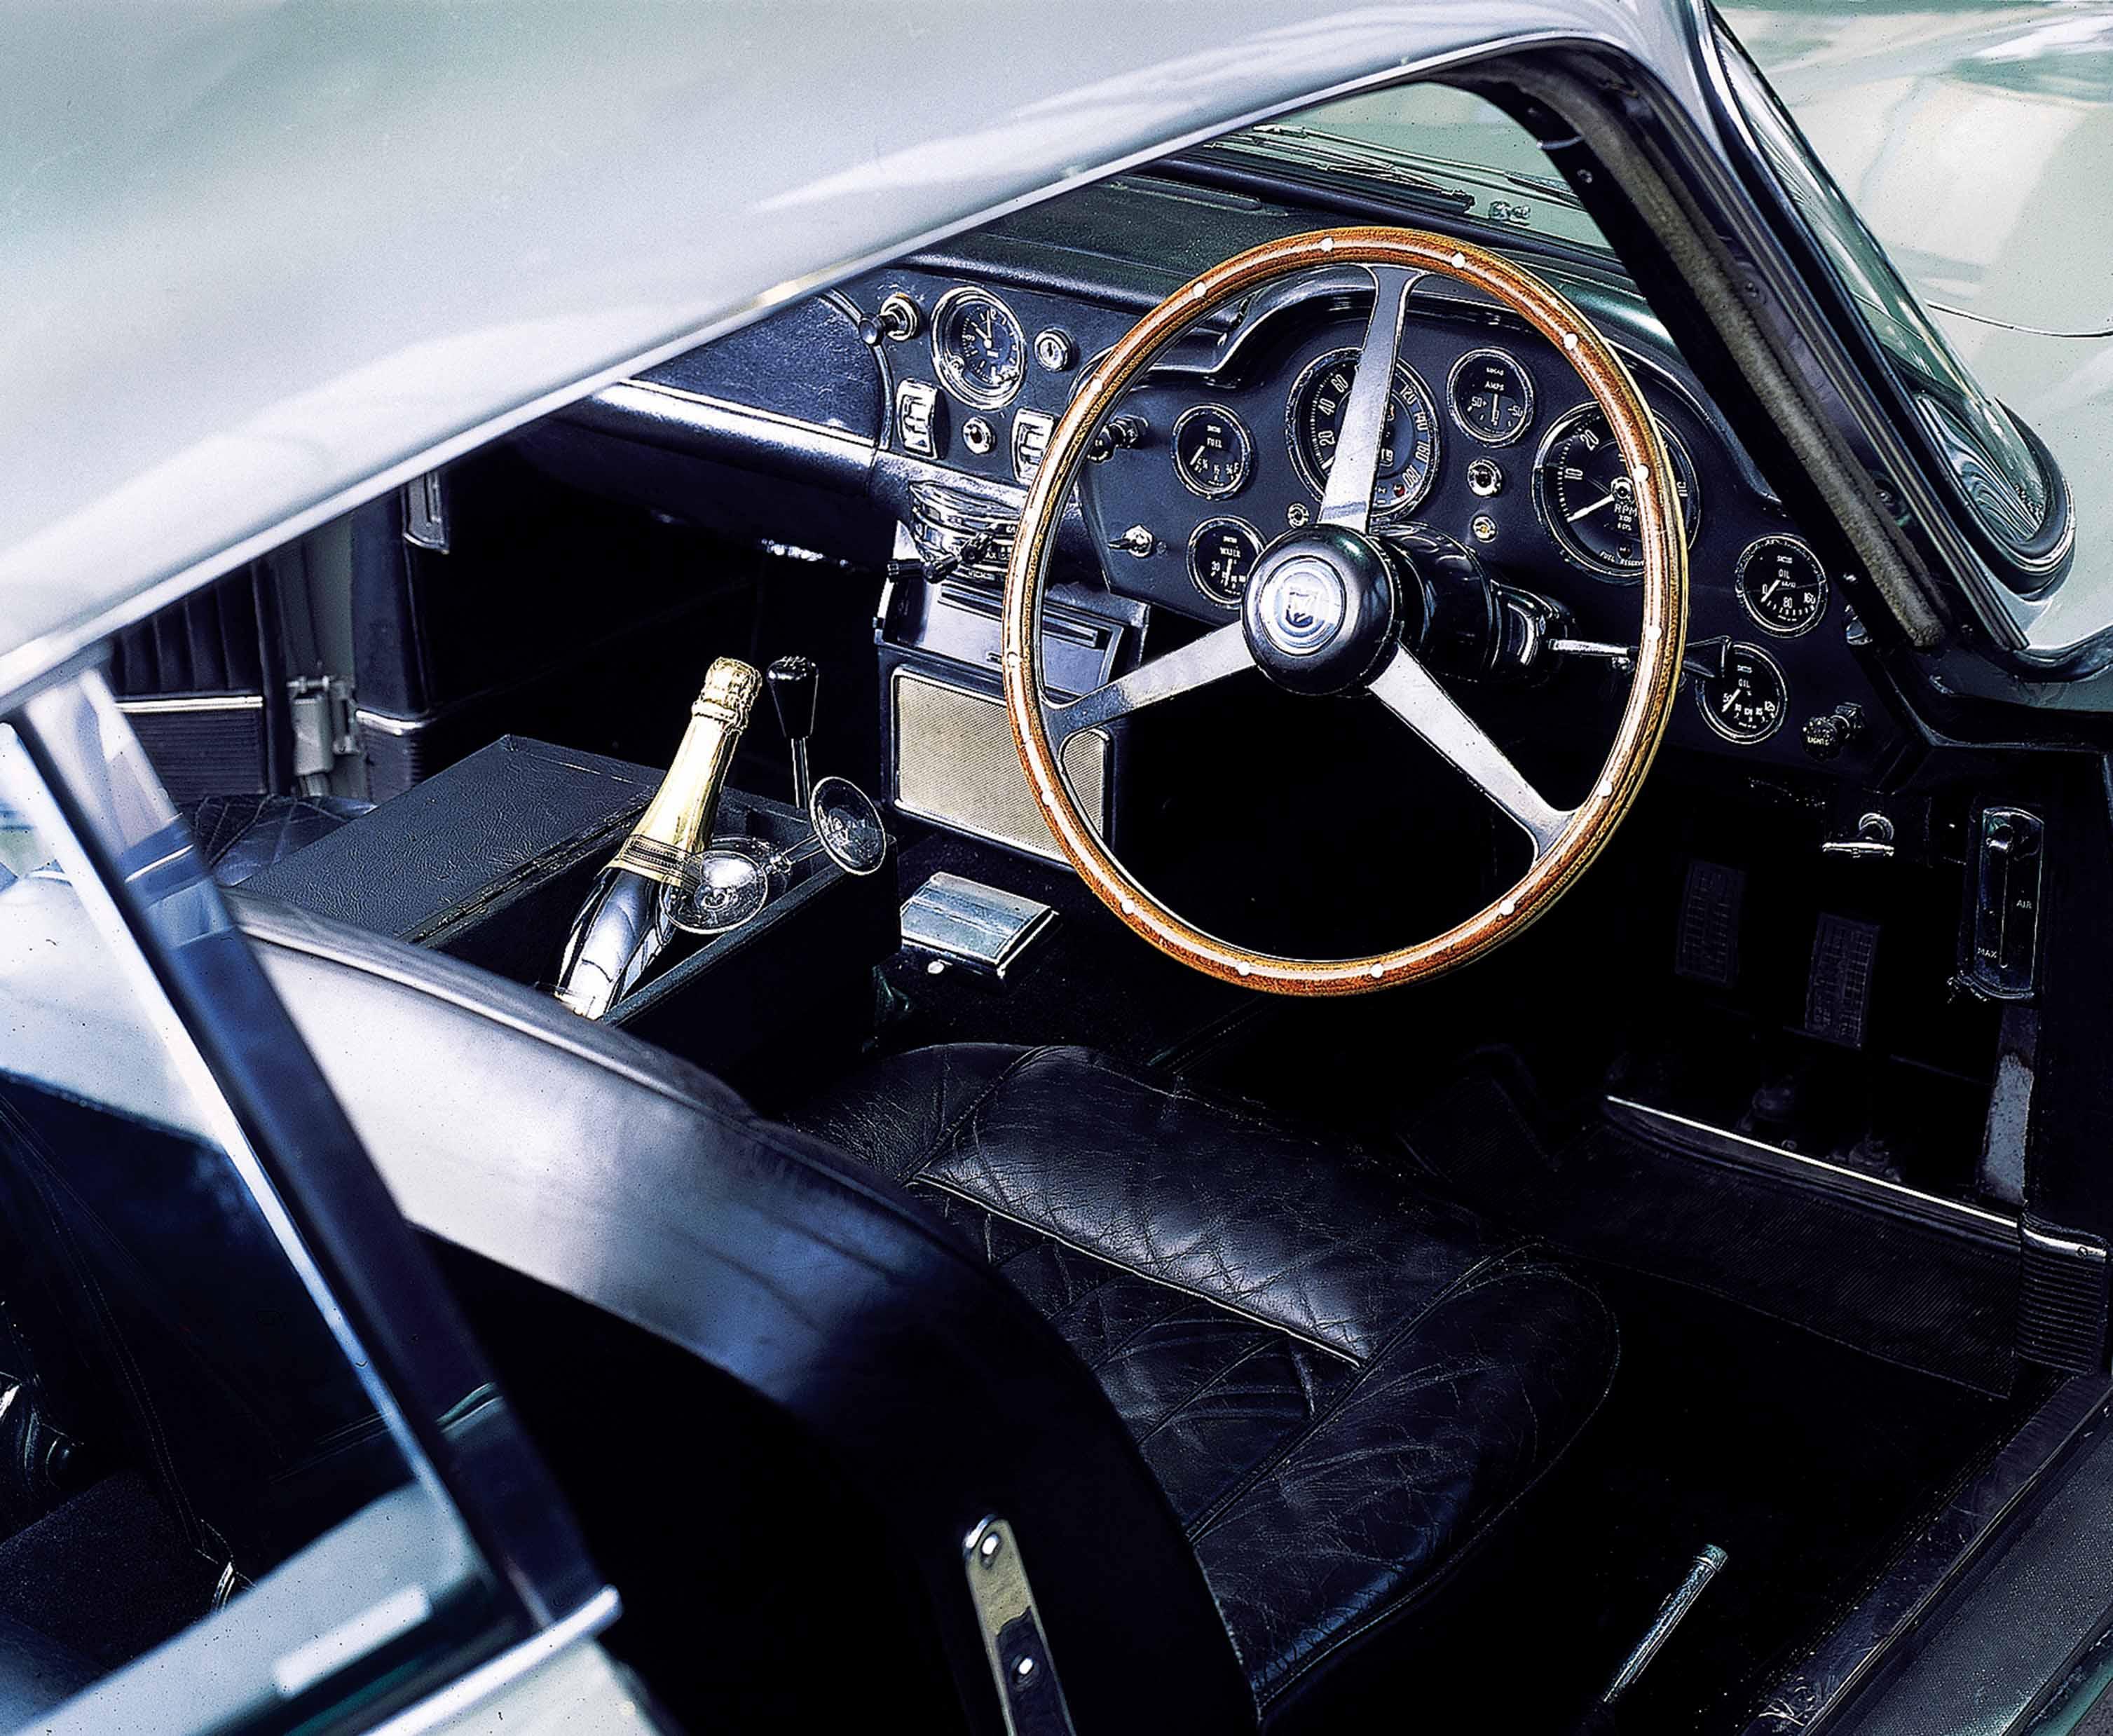 1965 Aston Martin DB5 Interior